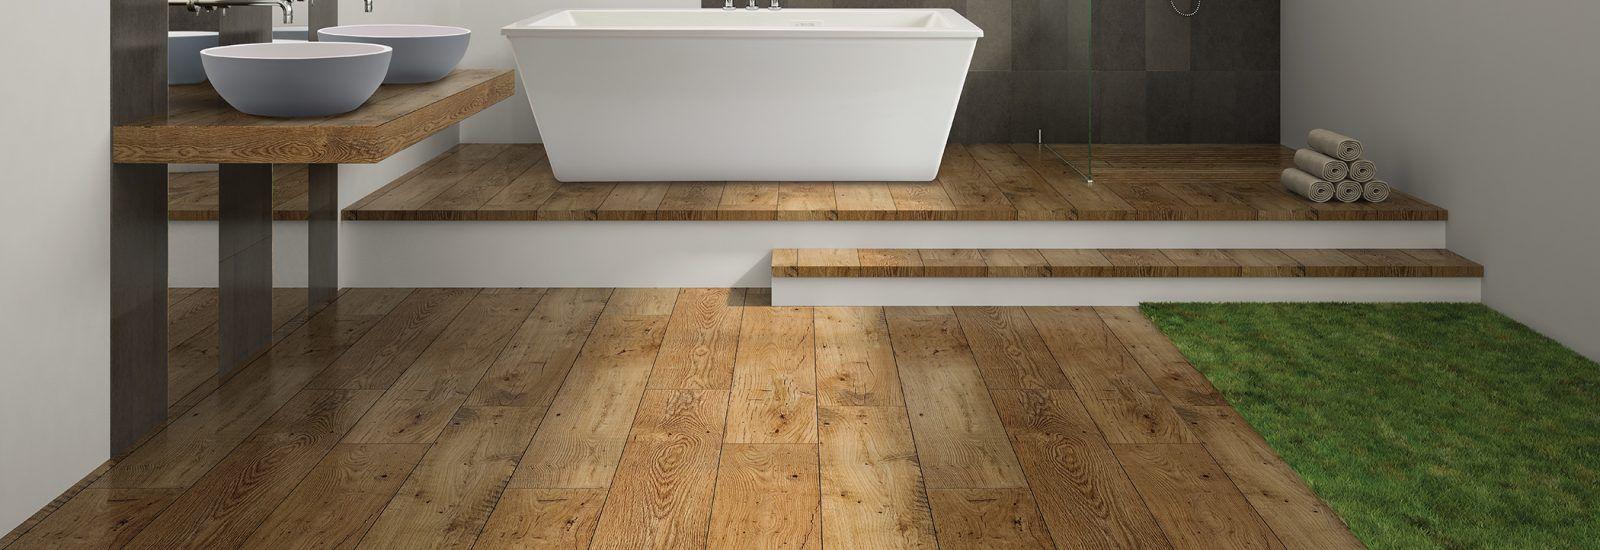 RM Living Cincinnati Interior Design Modern Bathroom By MTI MTI8